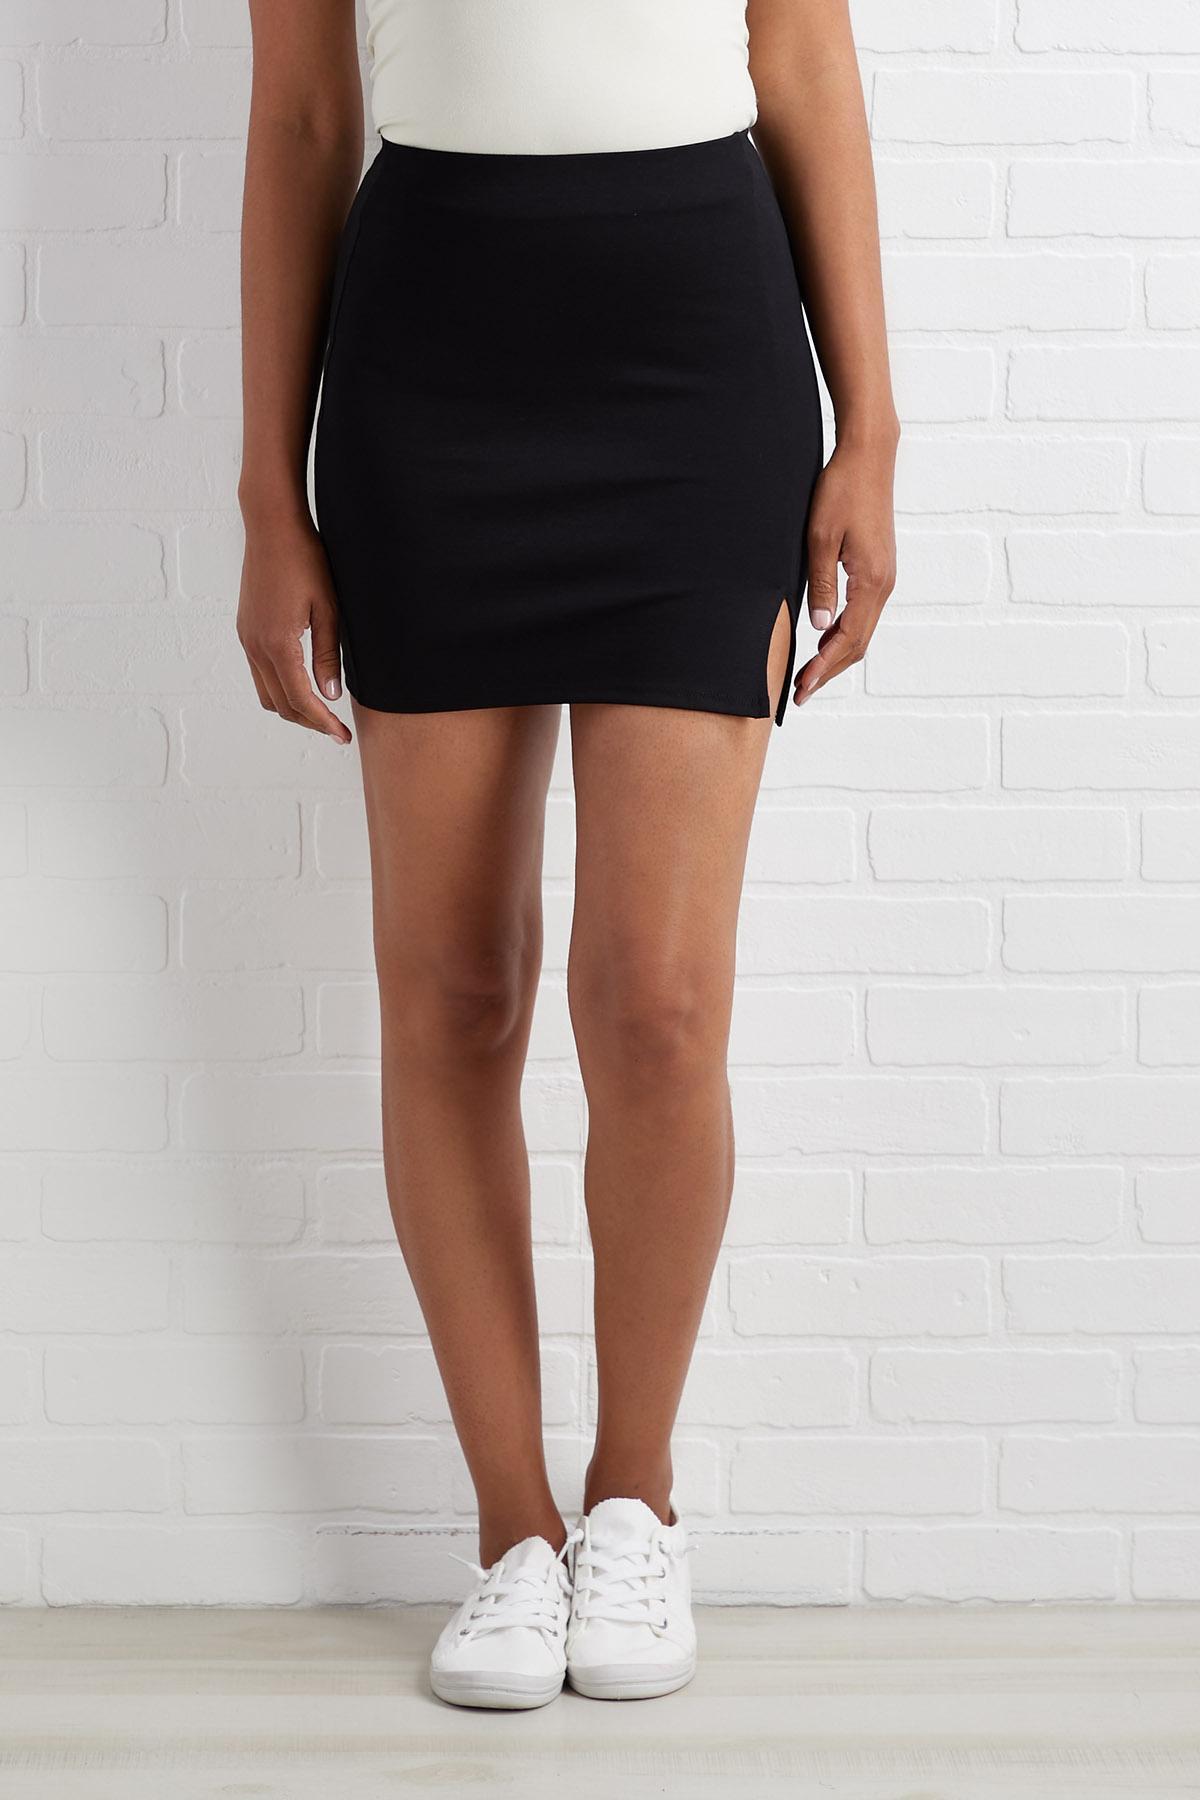 Sporty Spice Skirt